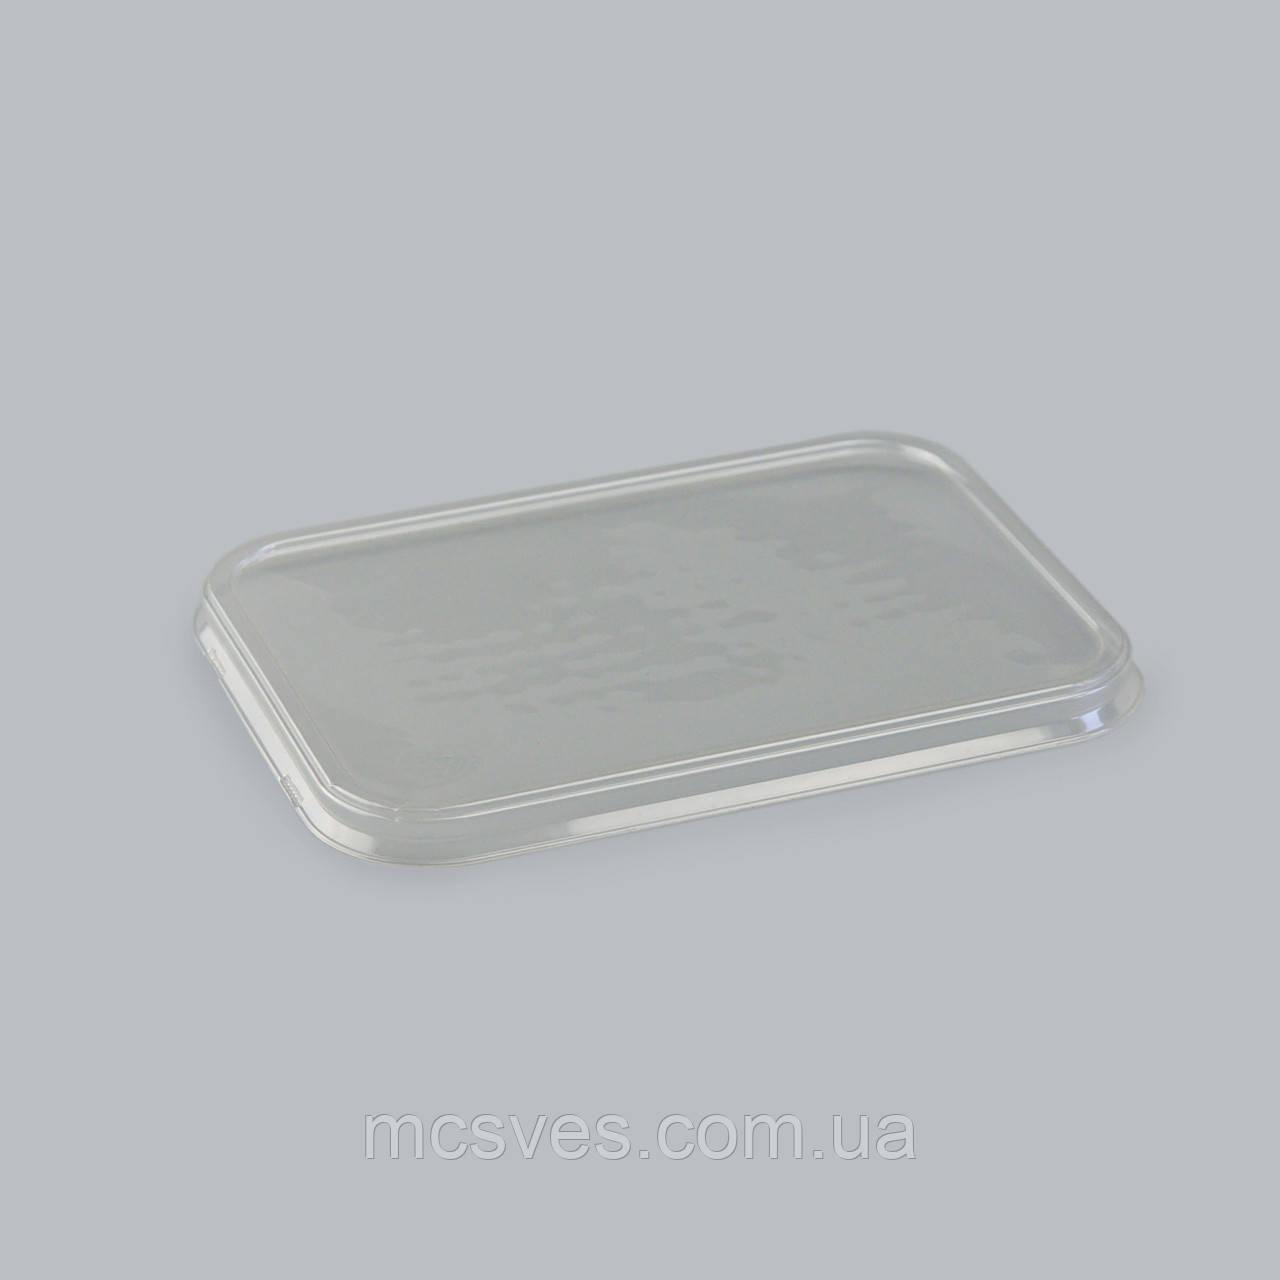 Крышка УК-361К PЕТ прозрачная, 720 шт/уп